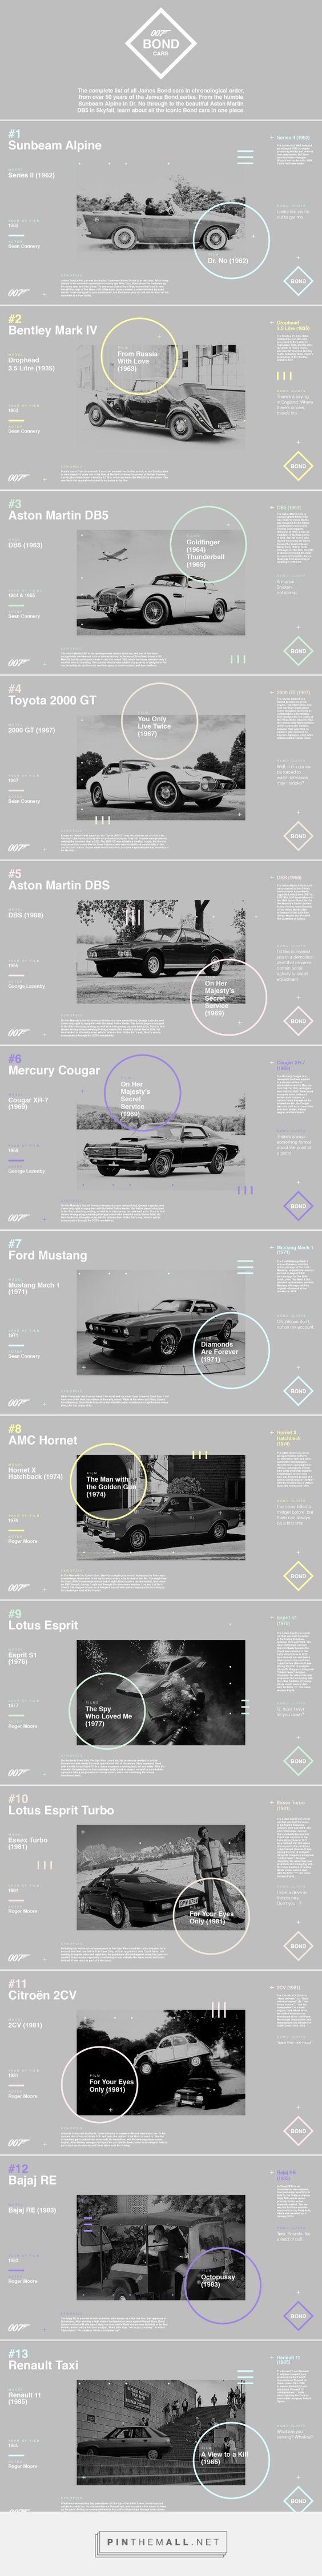 007 Bond Cars on Behance